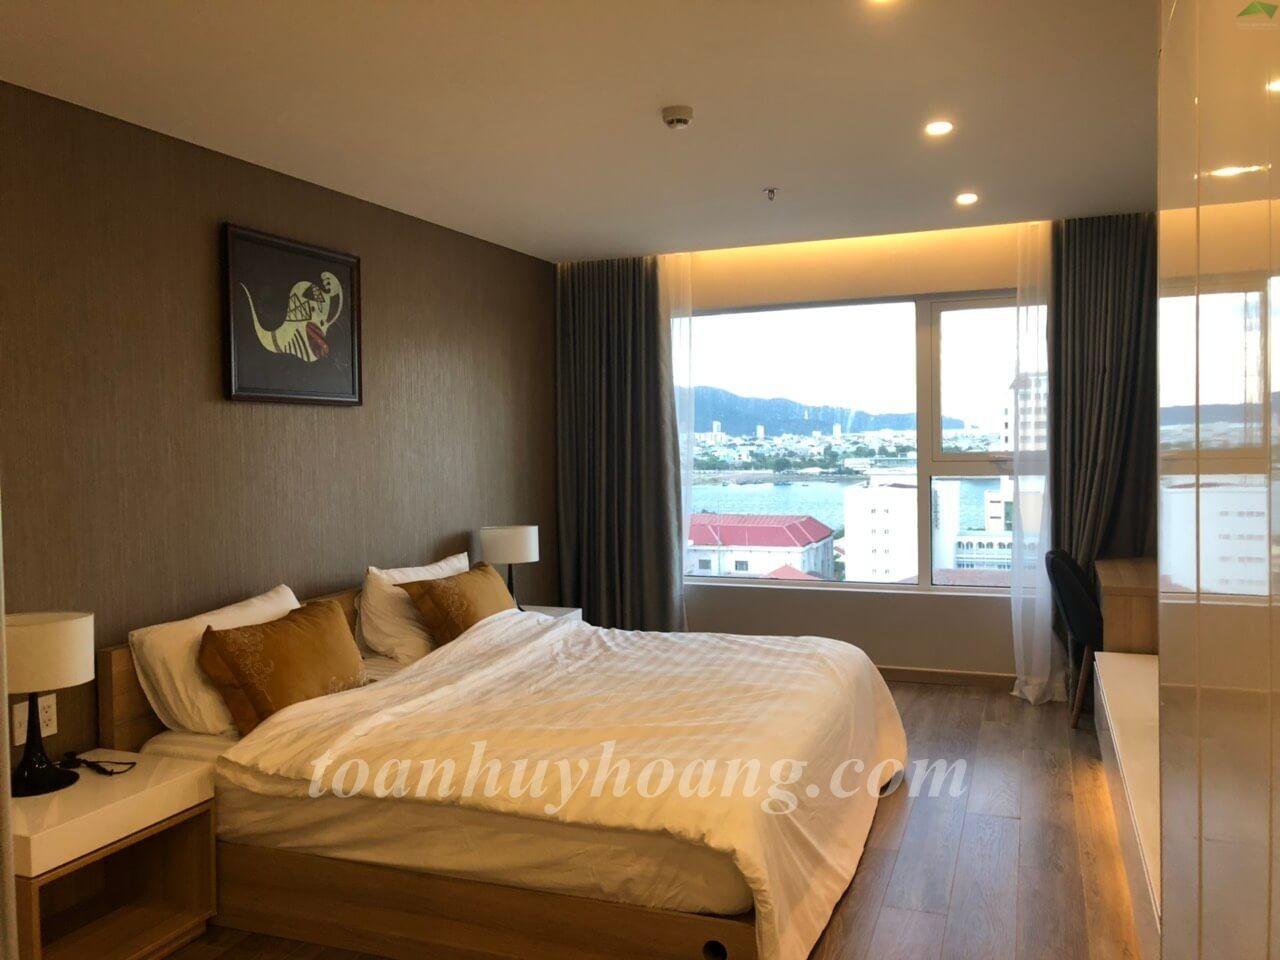 Fhome Apartment Da nang